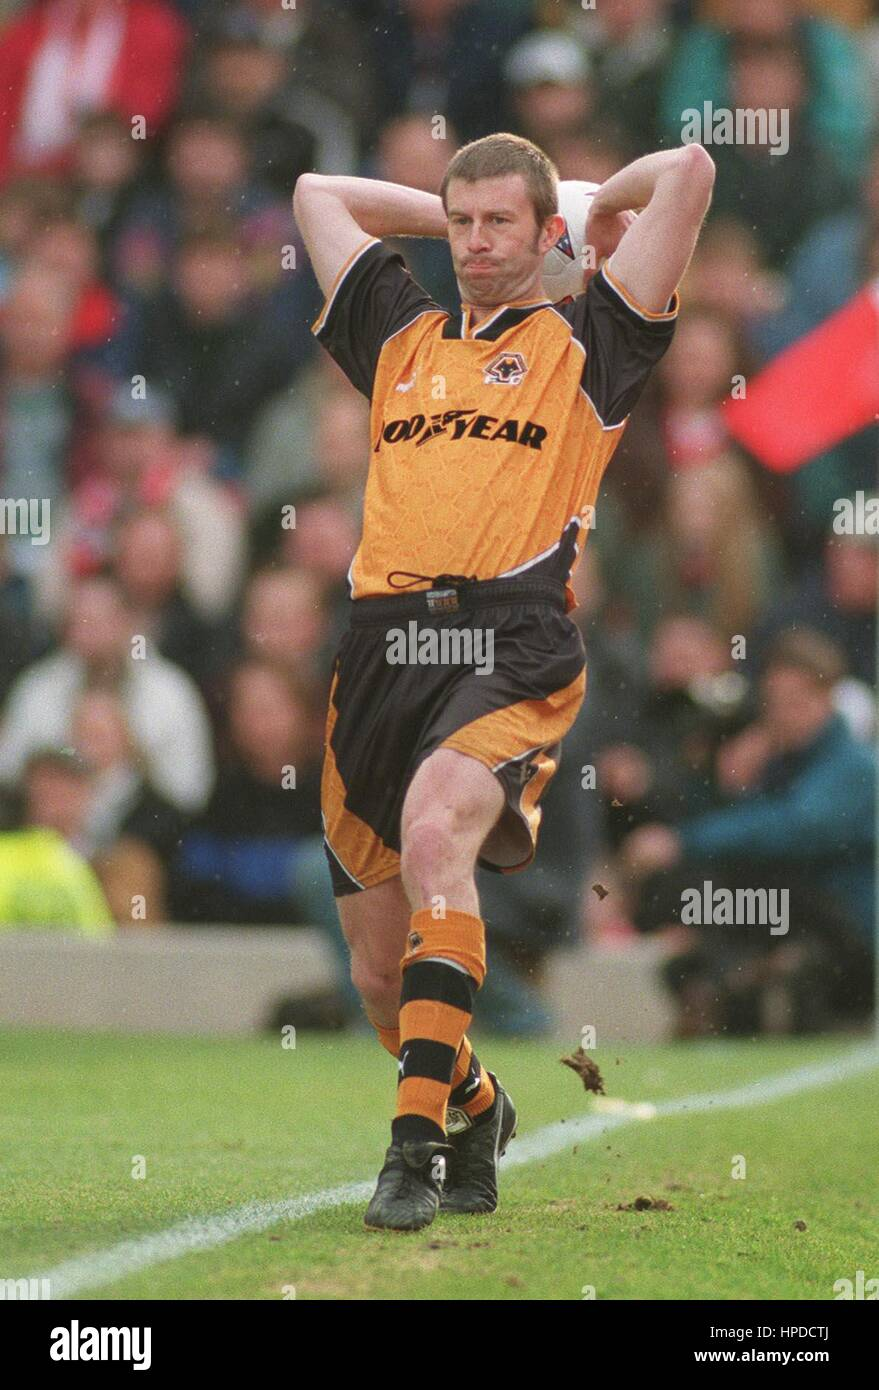 STEVE FROGGATT WOLVERHAMPTON WANDERERS FC 24 February 1997 - Stock Image